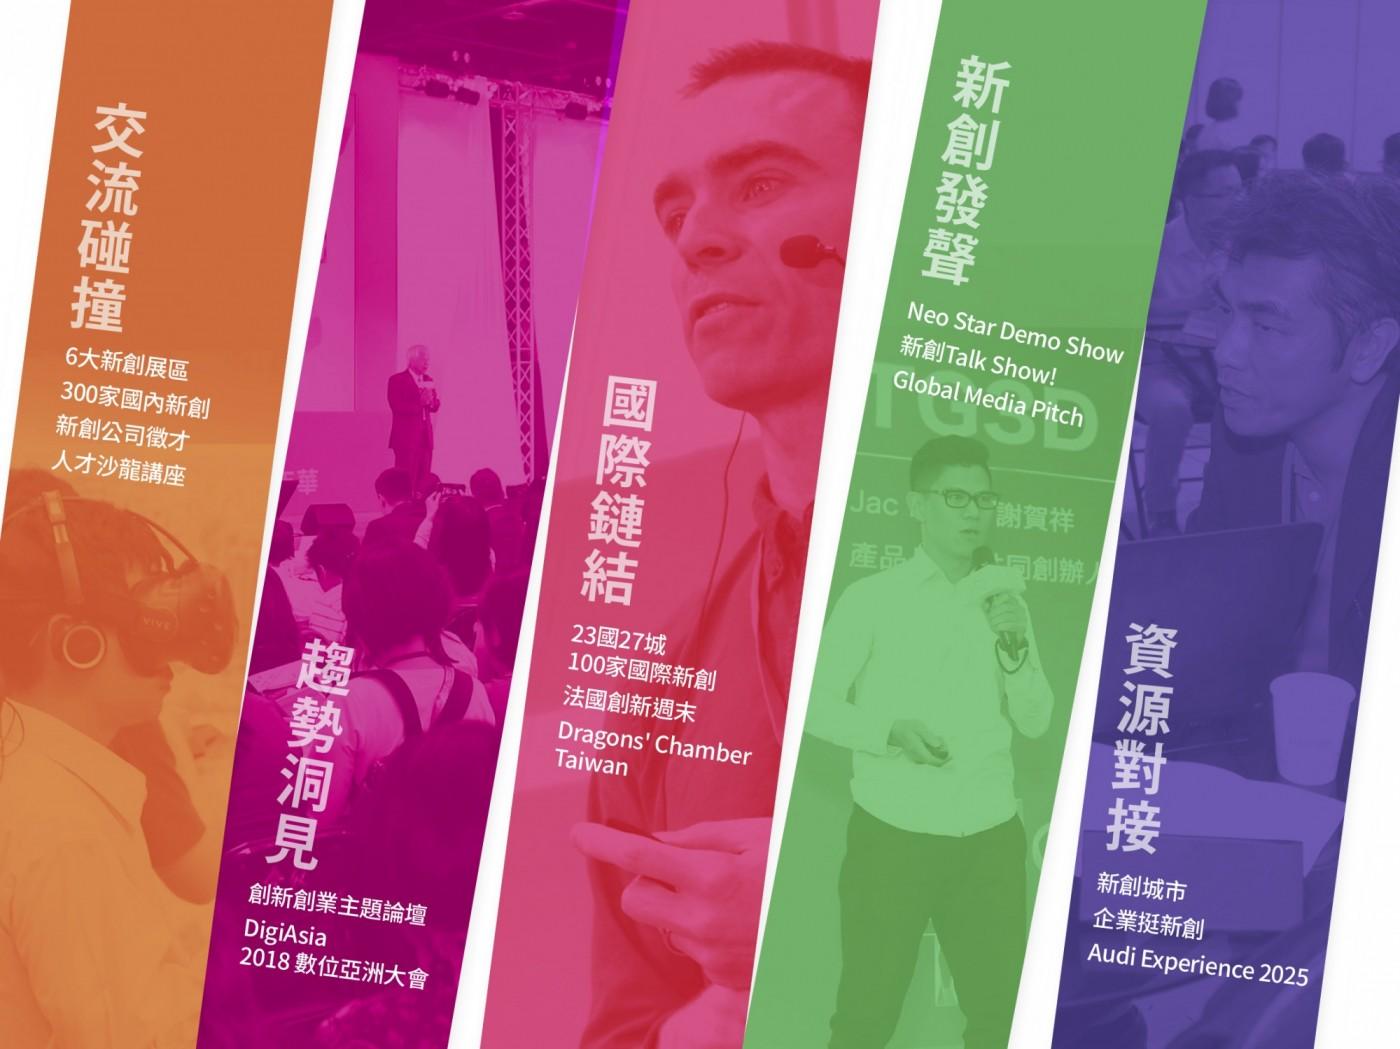 【2018 Meet Taipei搶先看】 按圖索驥,亞洲最大創新創業嘉年華全場攻略